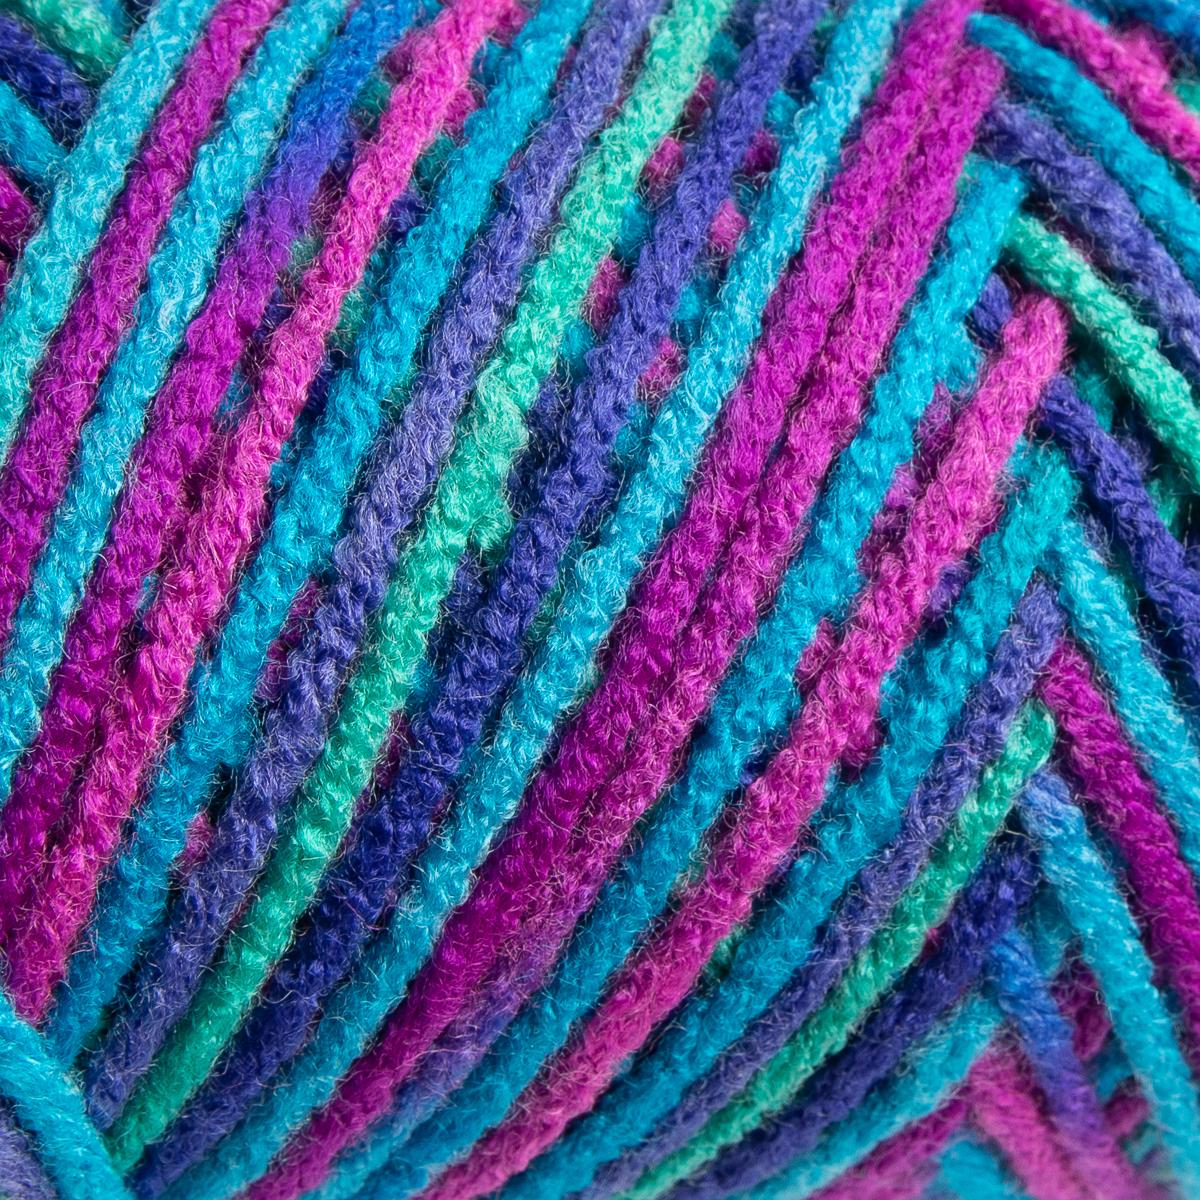 Red-Heart-With-Love-100-Acrylic-Yarn-Knitting-Crochet-Medium-4-Skein-Soft thumbnail 20